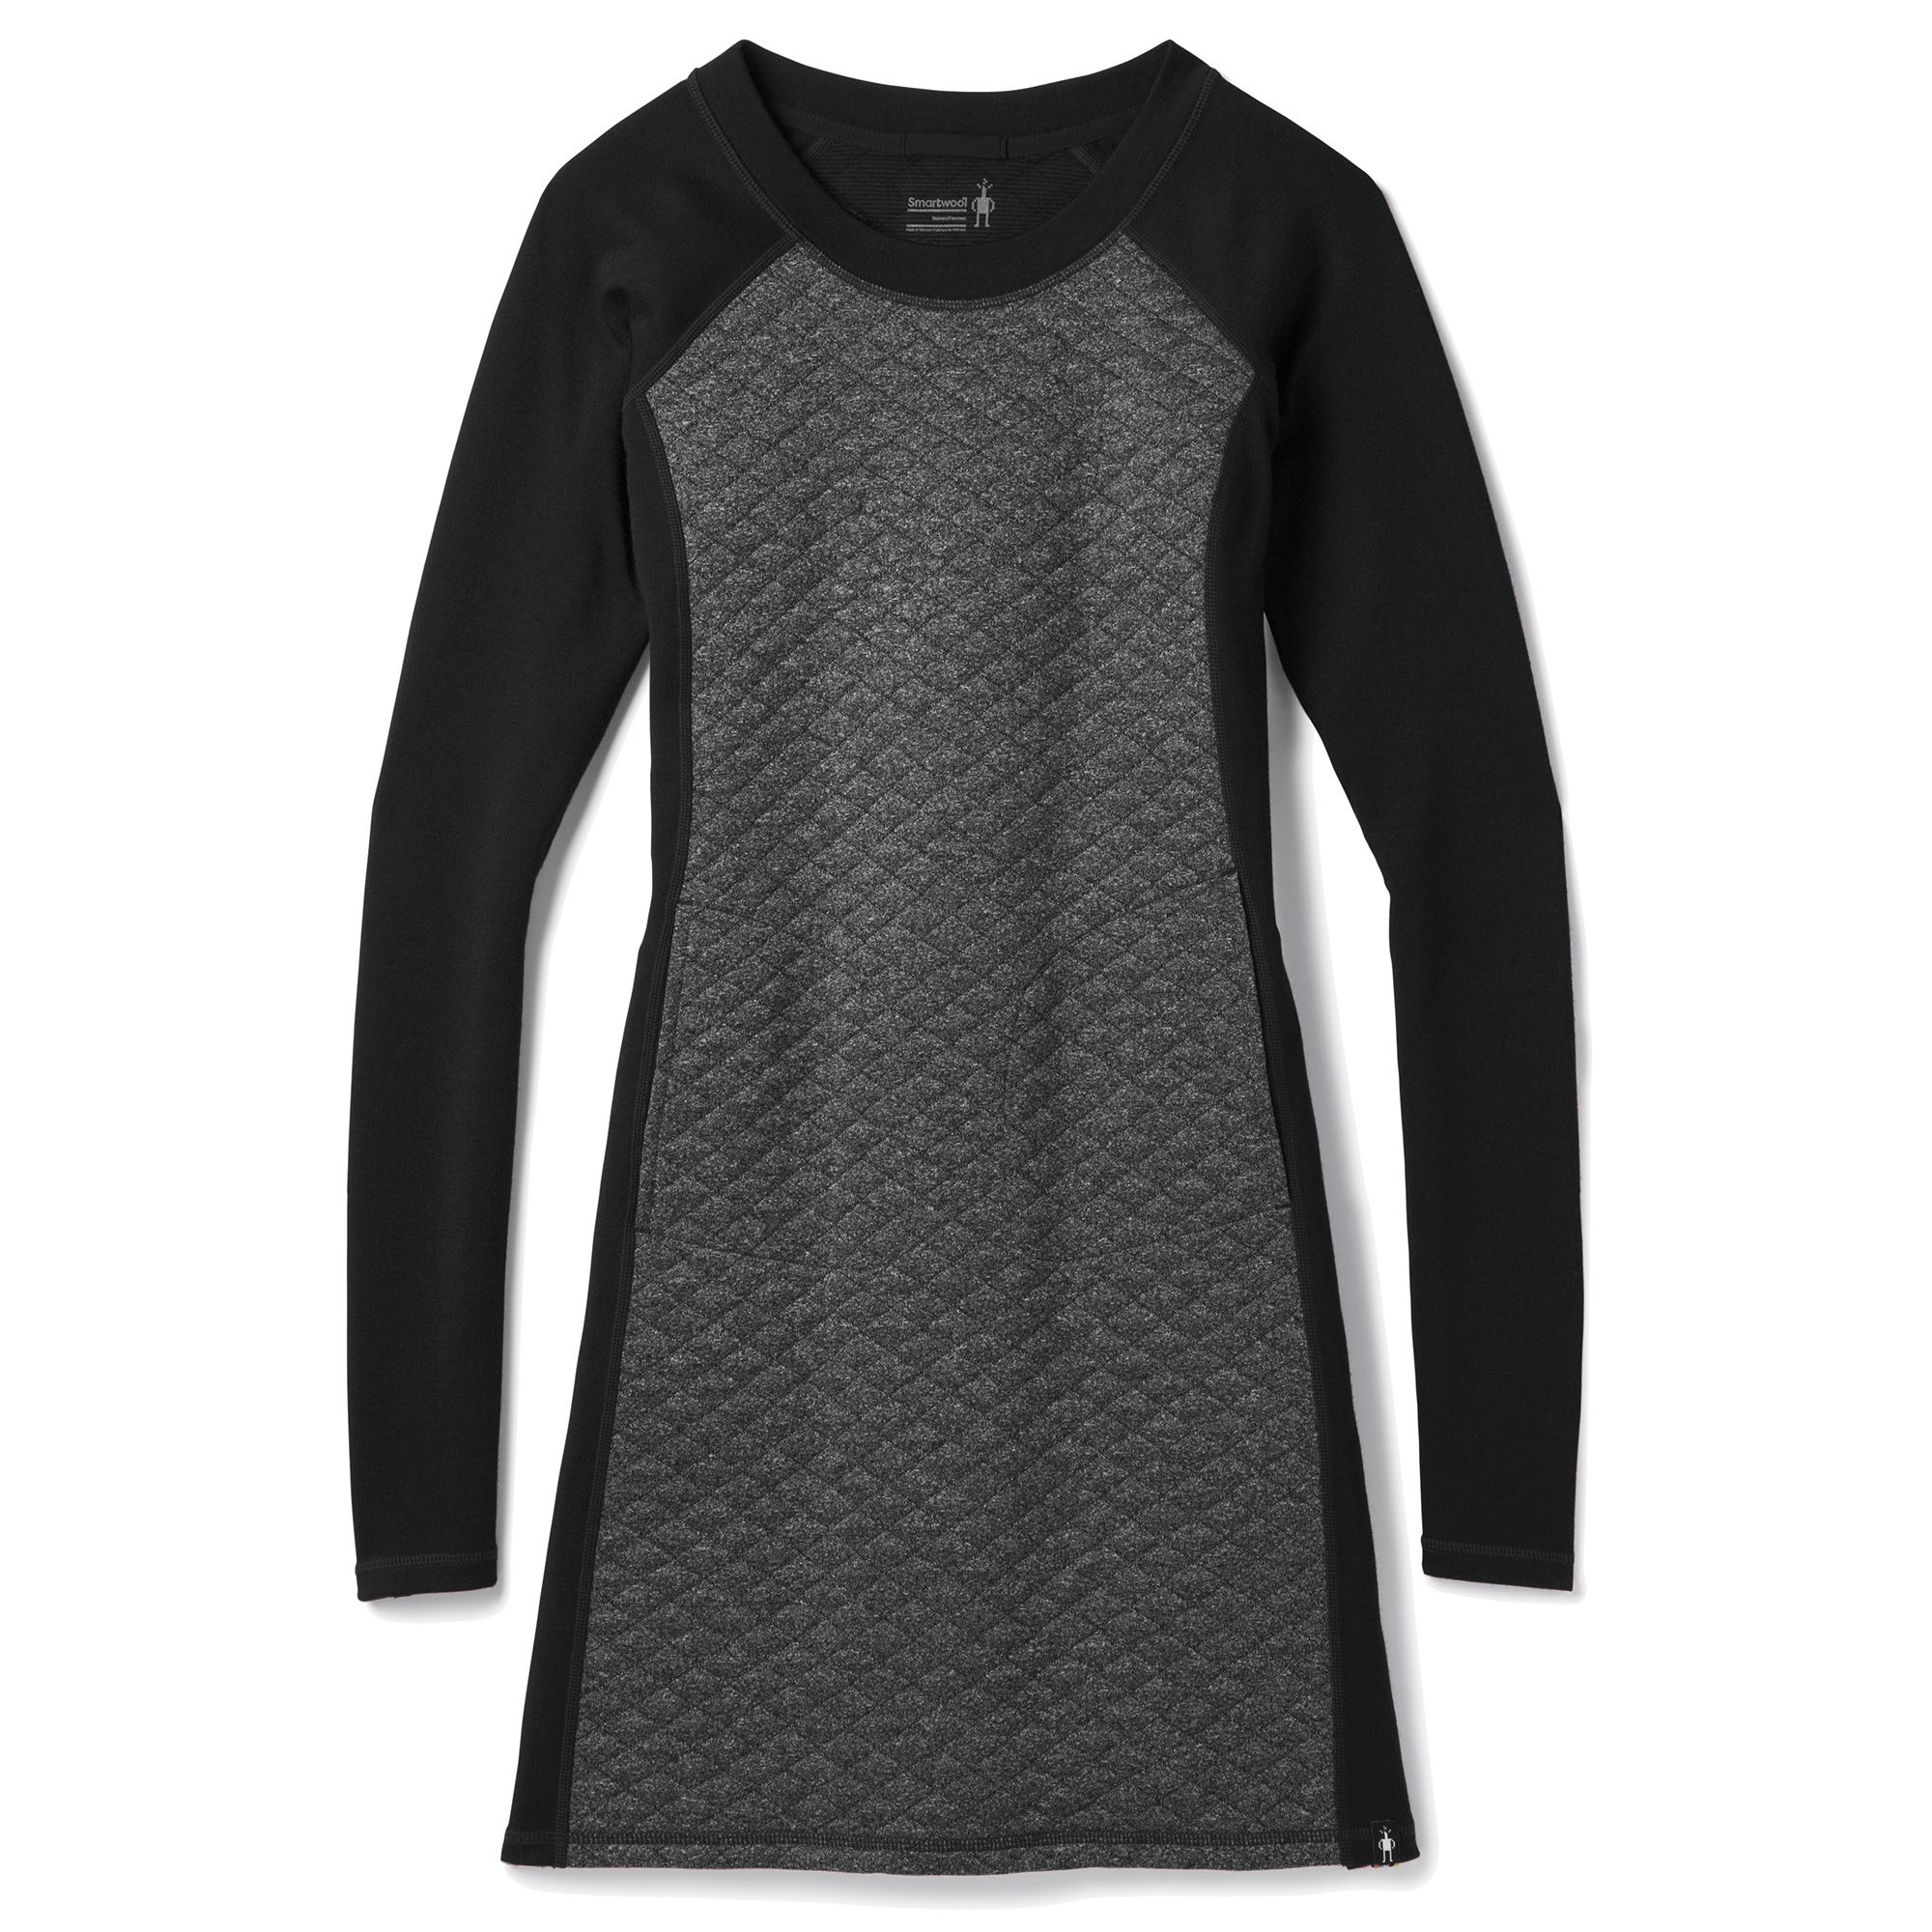 Women's Diamond Peak Quilted Dress